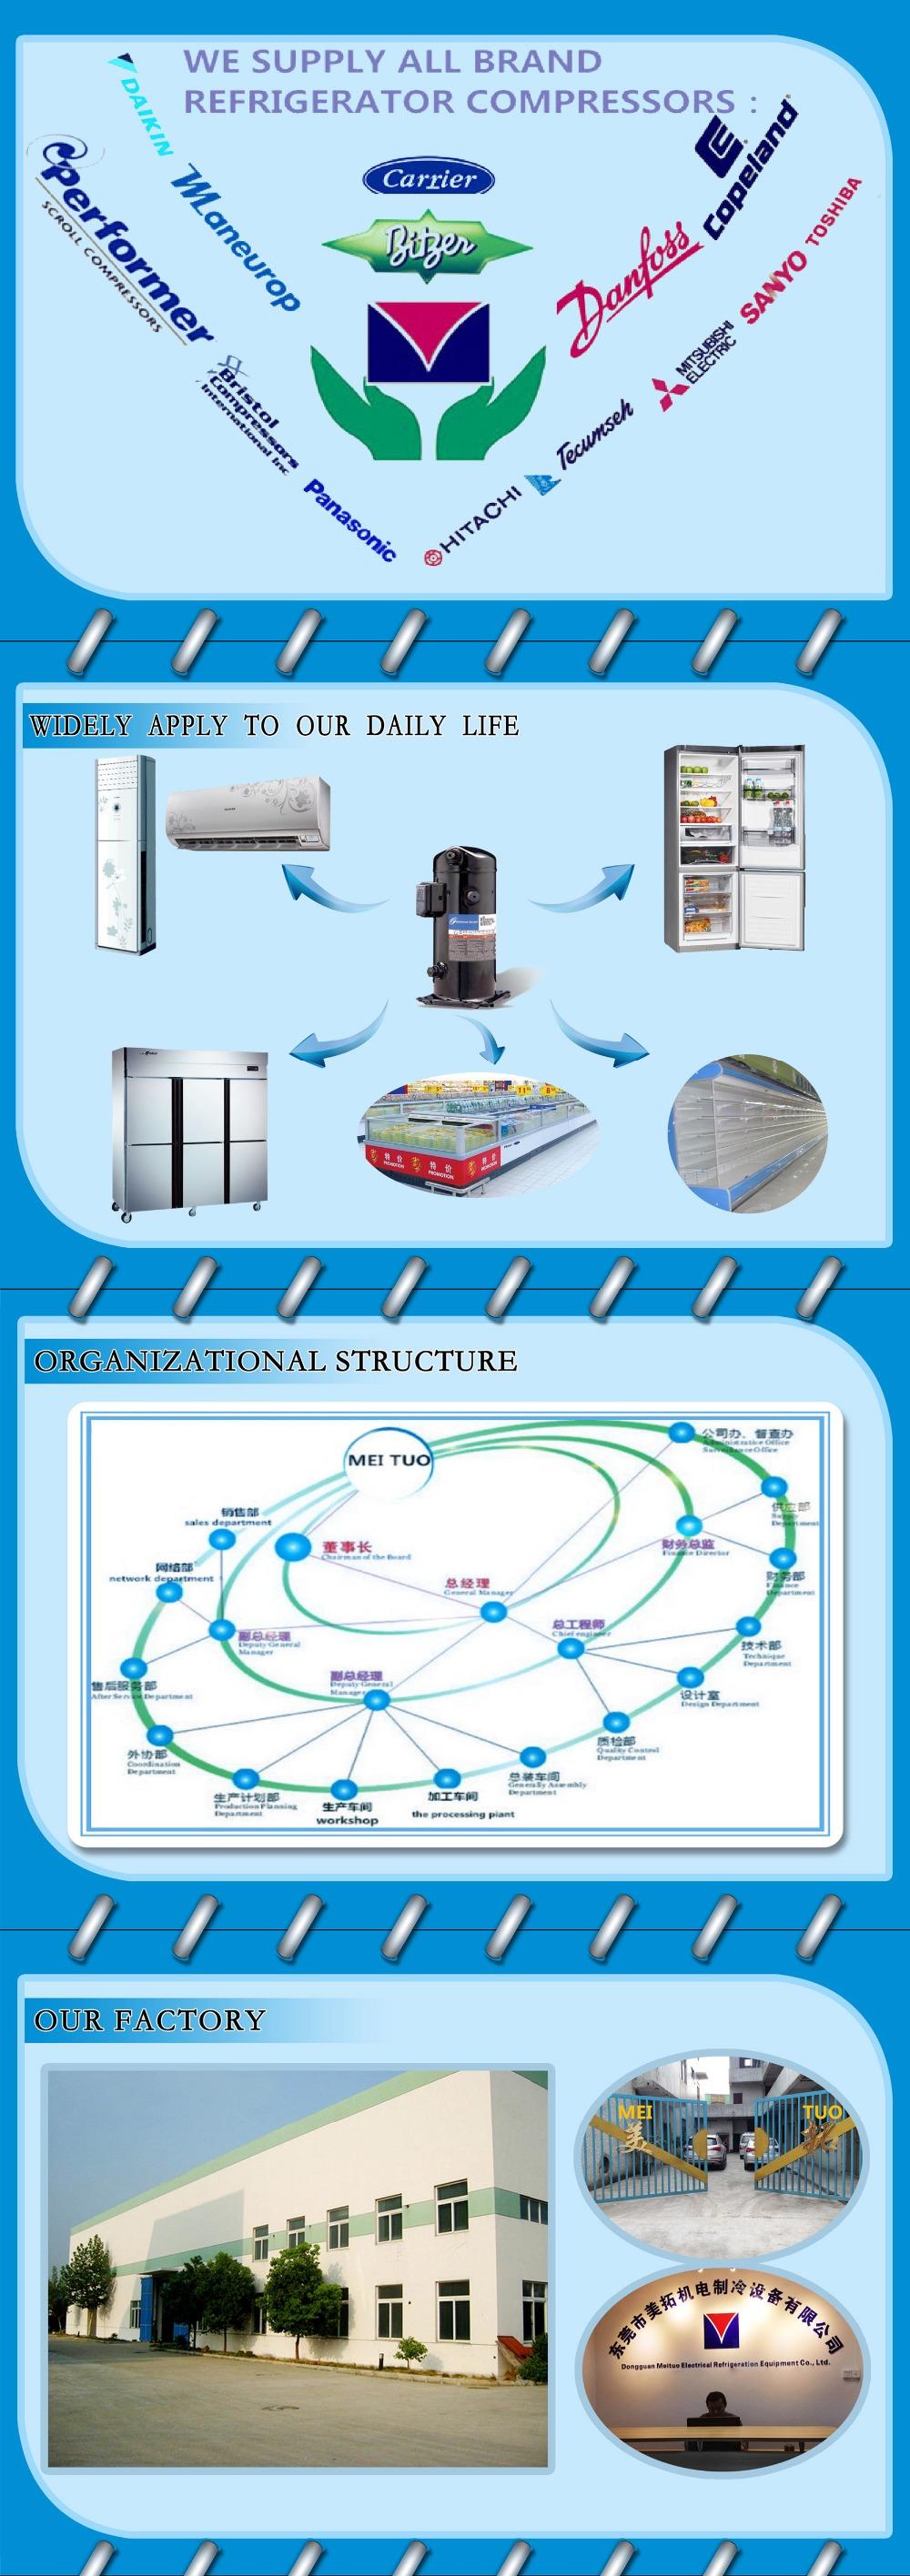 Wiring Diagrams Refrigeration Http Www Macspares Co Za Wiring Diagrams